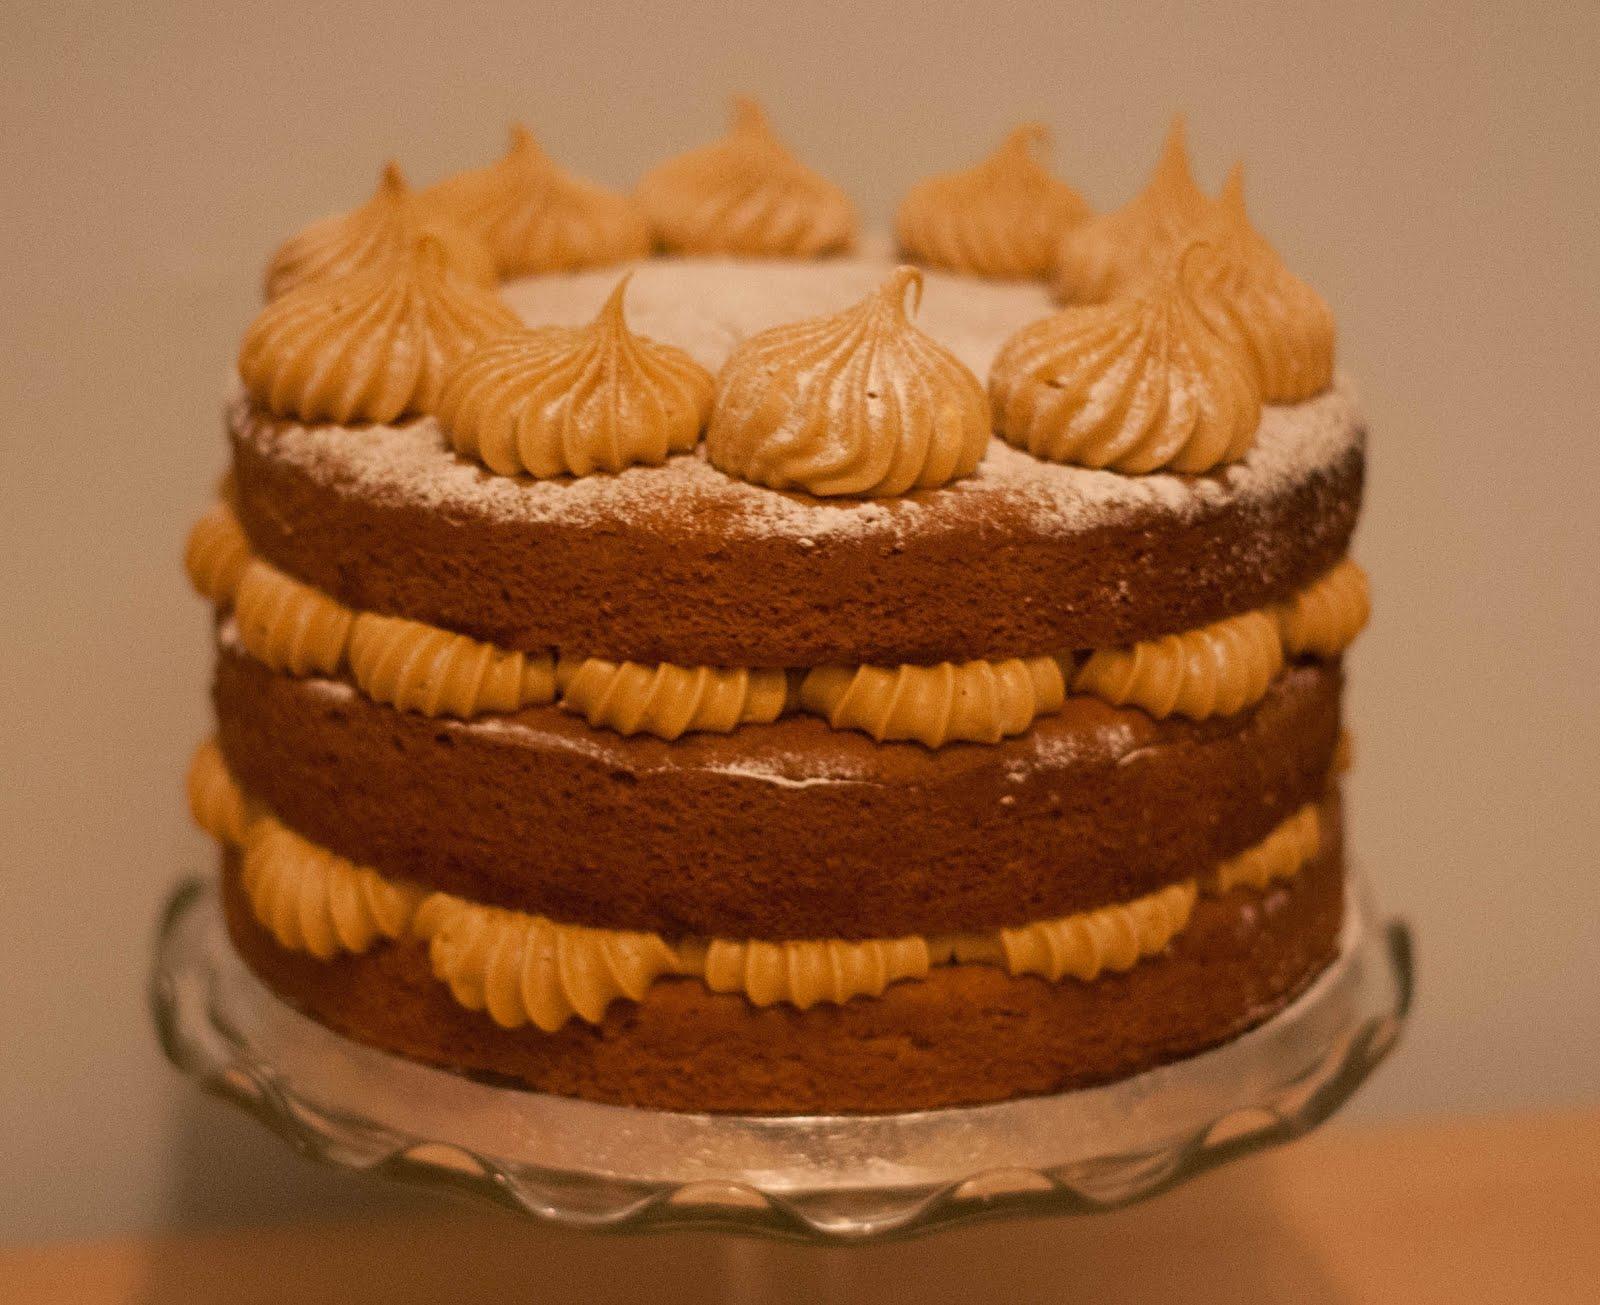 Vegan Cake Recipes Uk: A Spoonful Of Sugar: Speculoos Cake (vegan